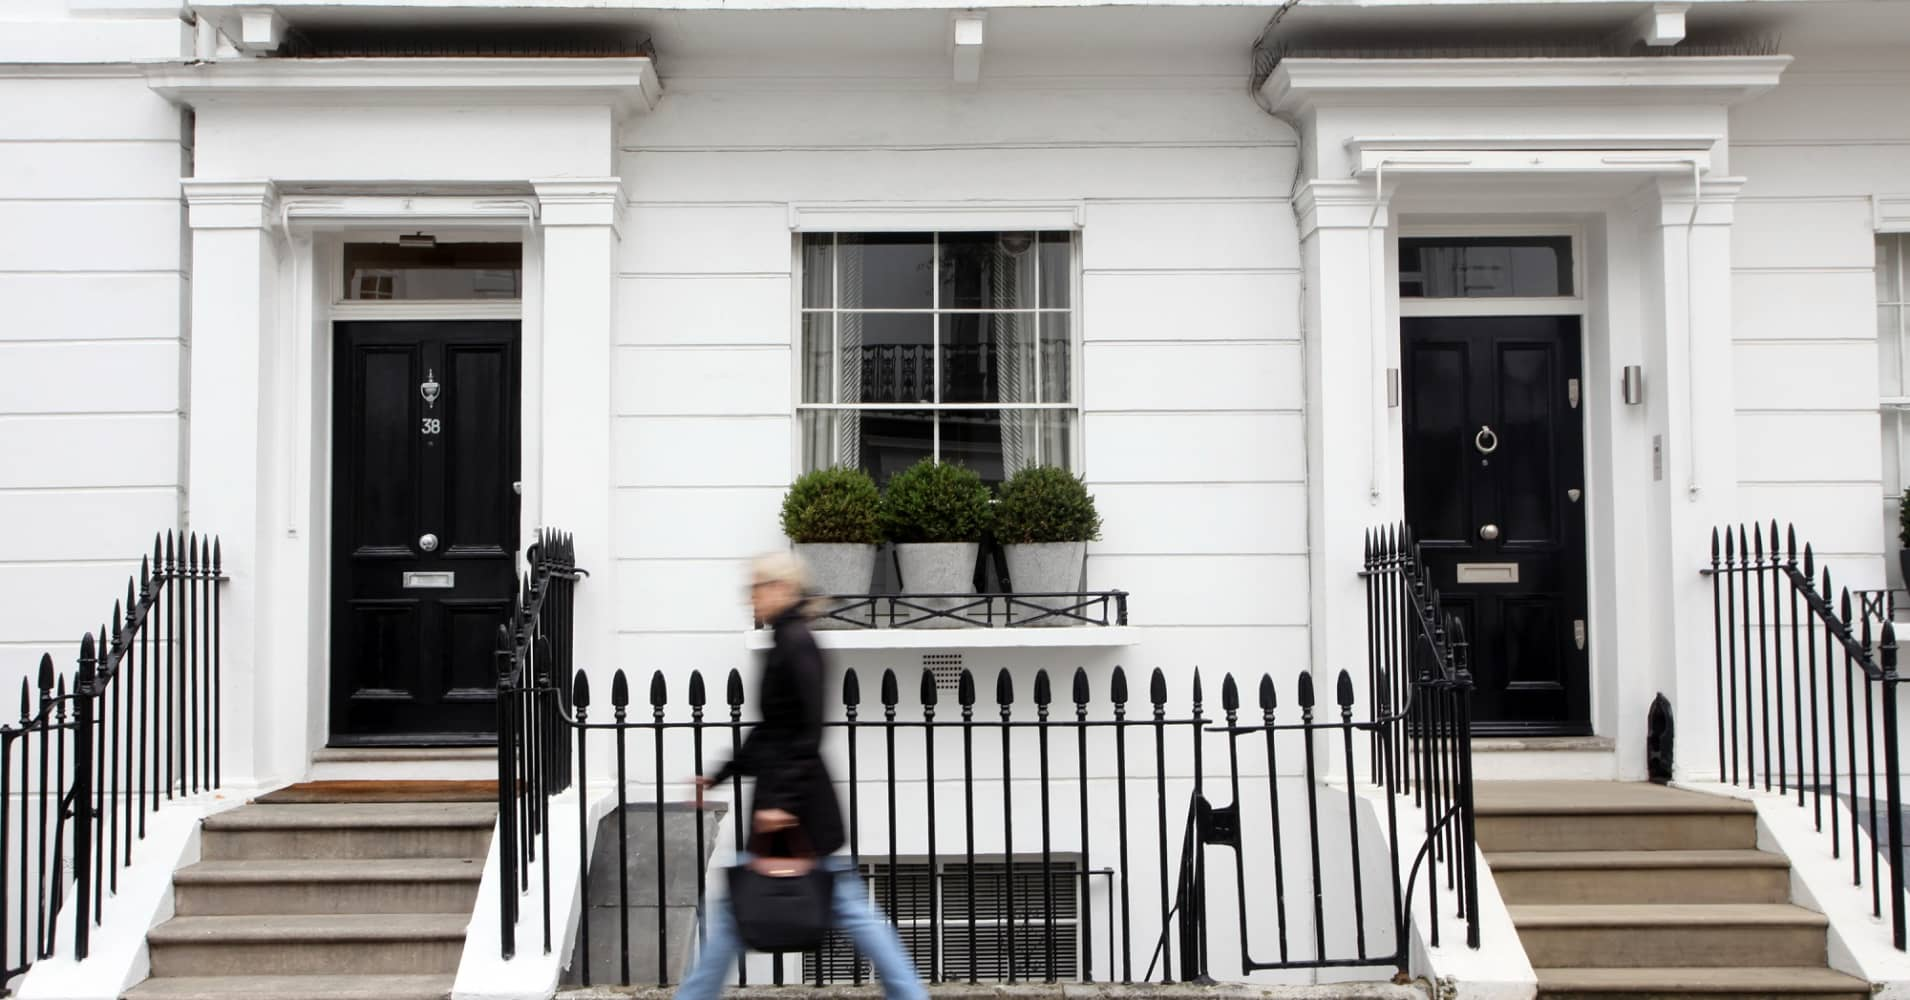 A pedestrian passes luxury residential properties in Knightsbridge in London, U.K.